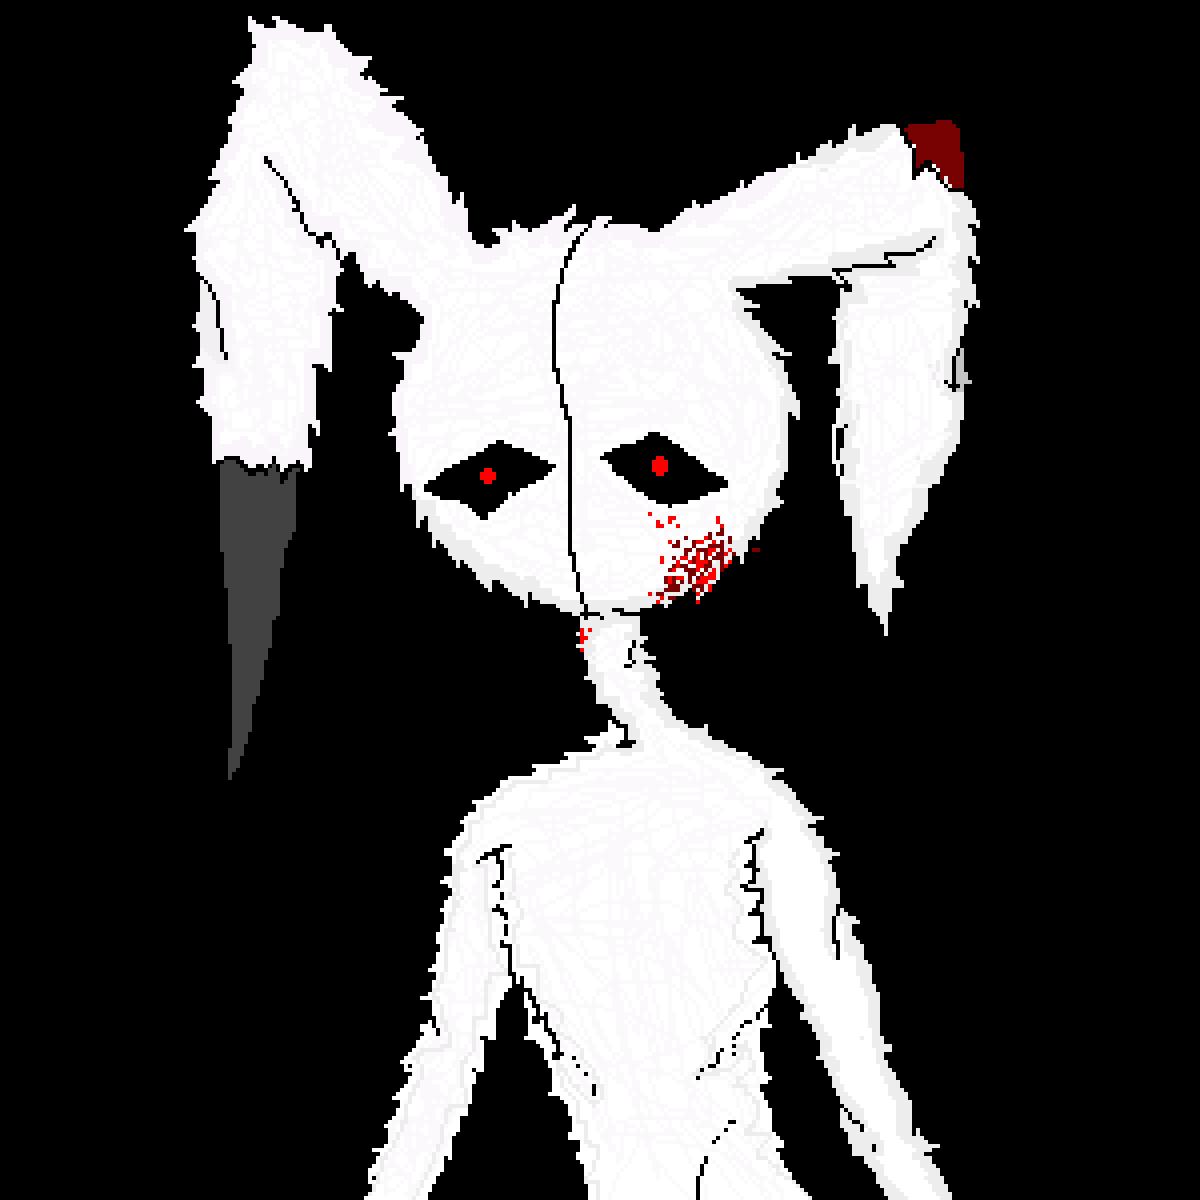 Monster by DarkAconite